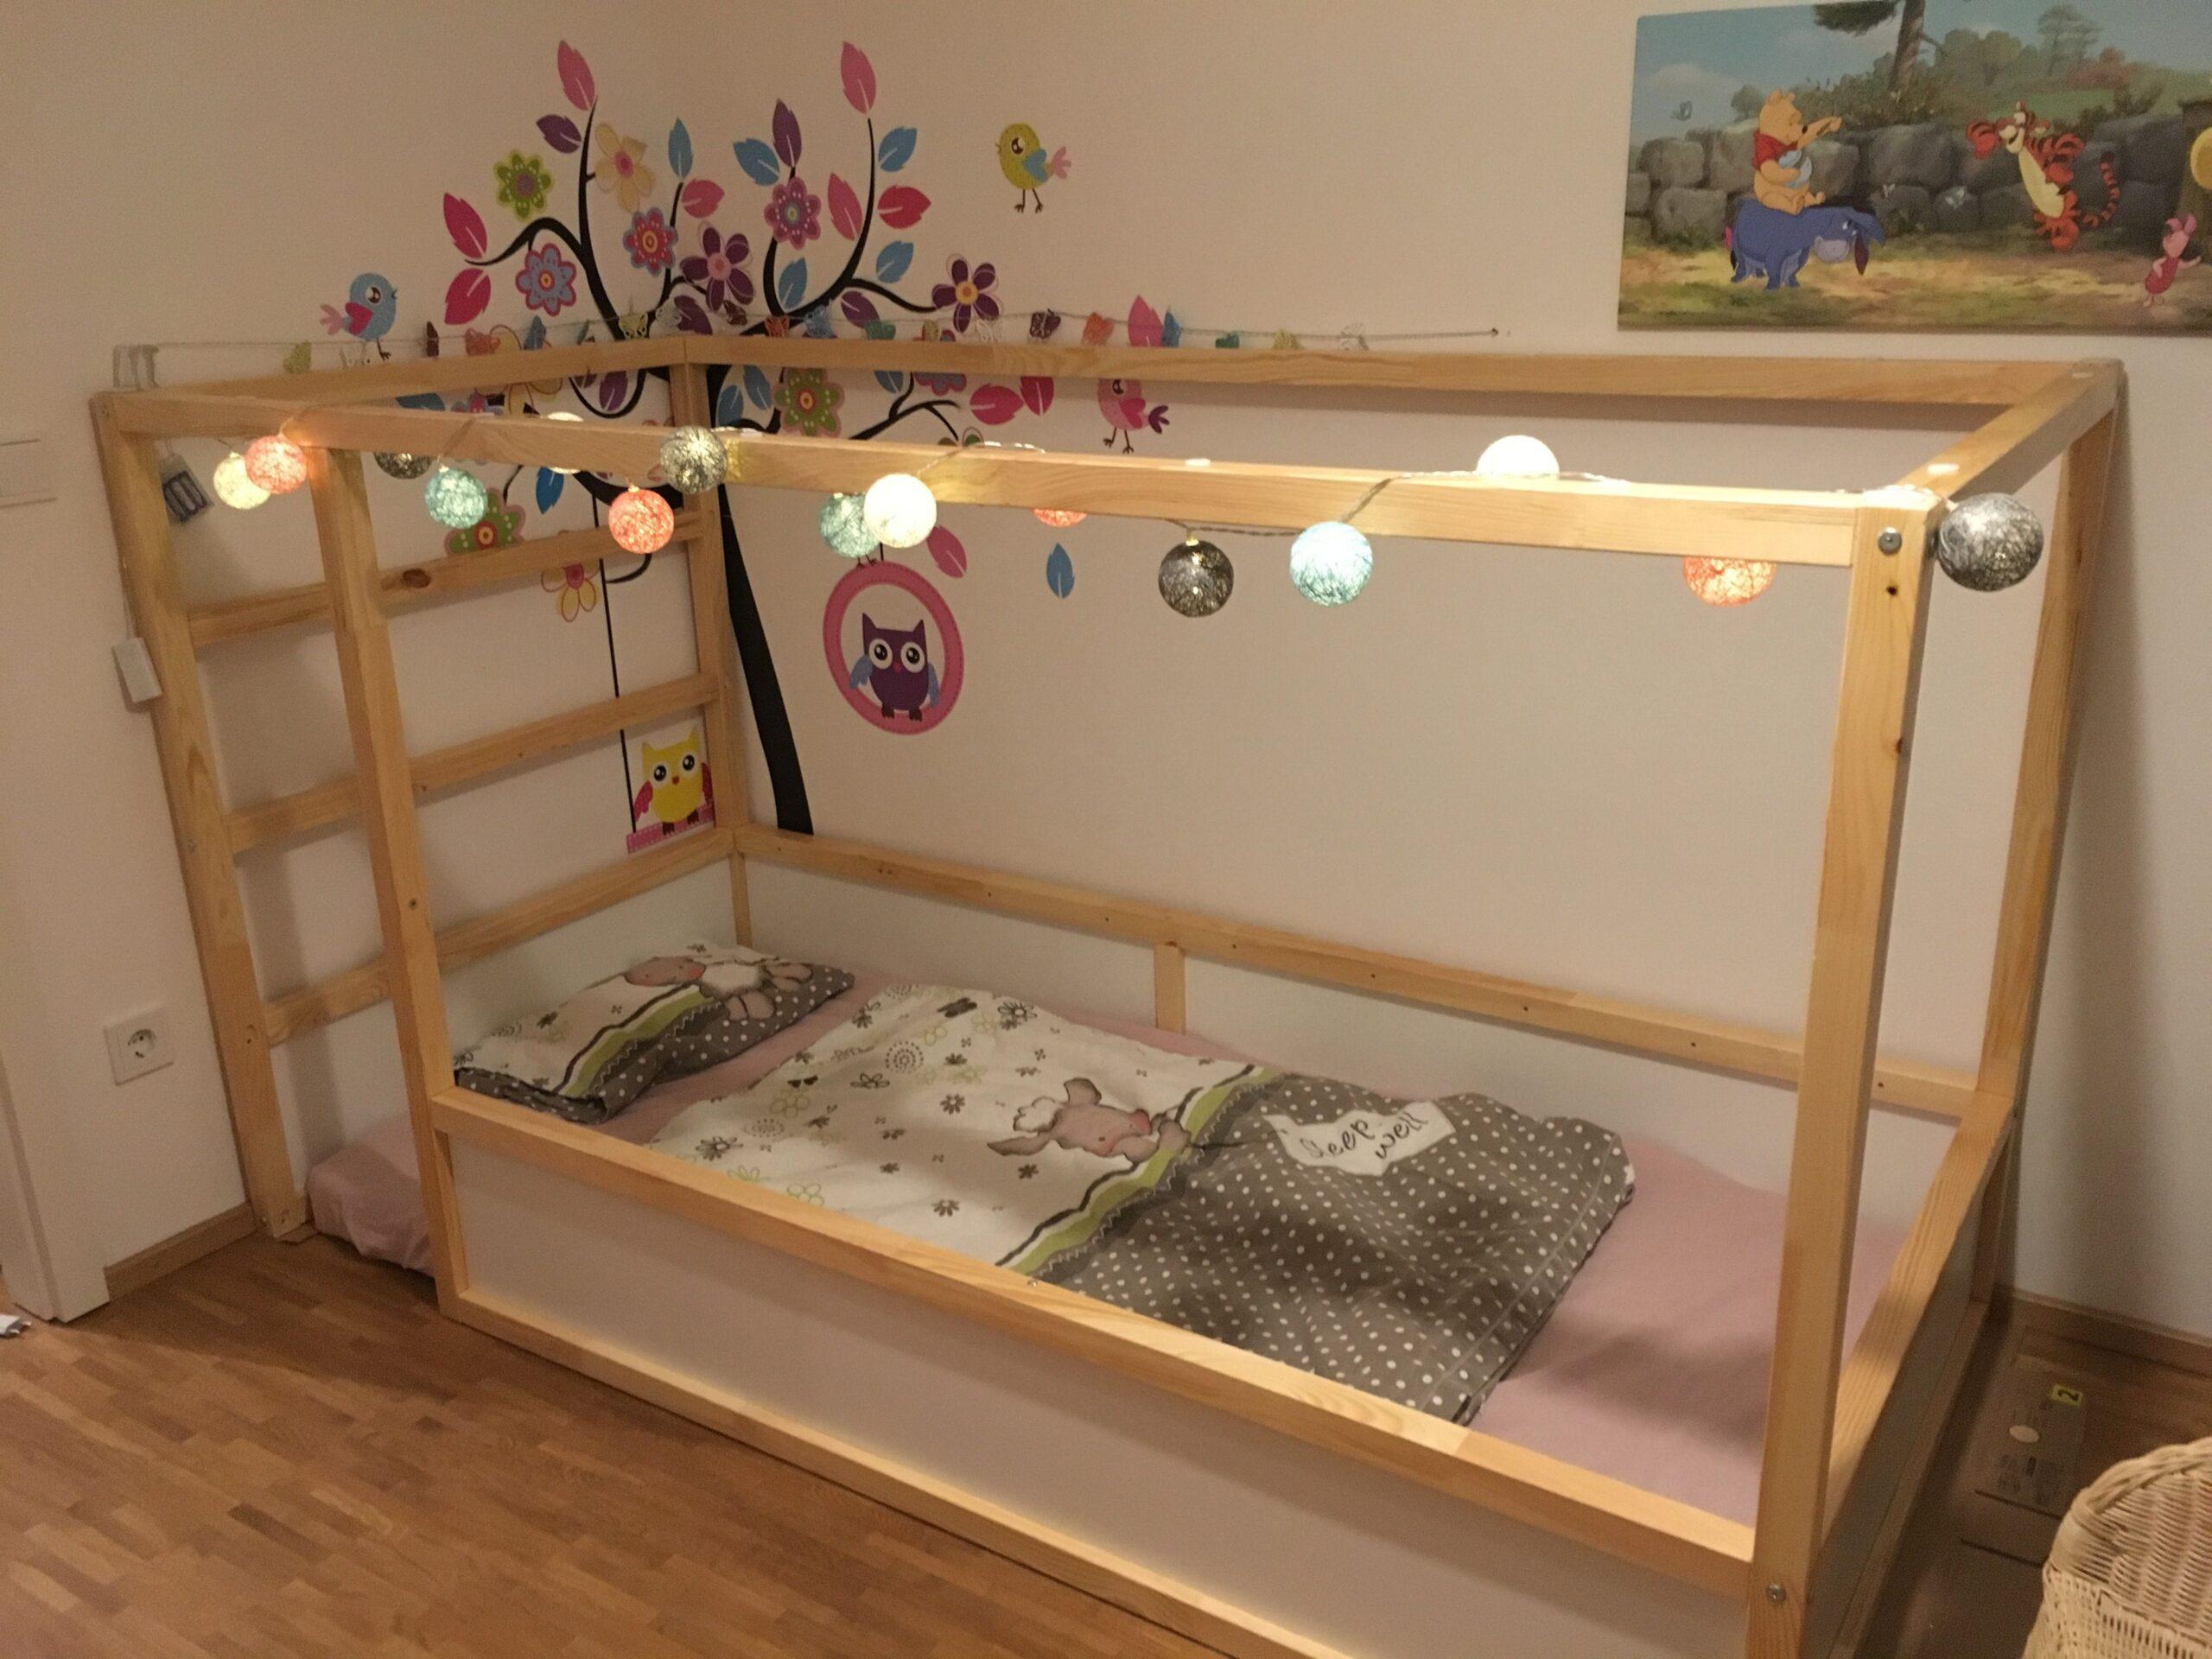 Full Size of Kura Hack Ikea Bed Storage Hacks House Montessori Underneath Stairs Drawers Floor Bunk Instructions Wohnzimmer Kura Hack